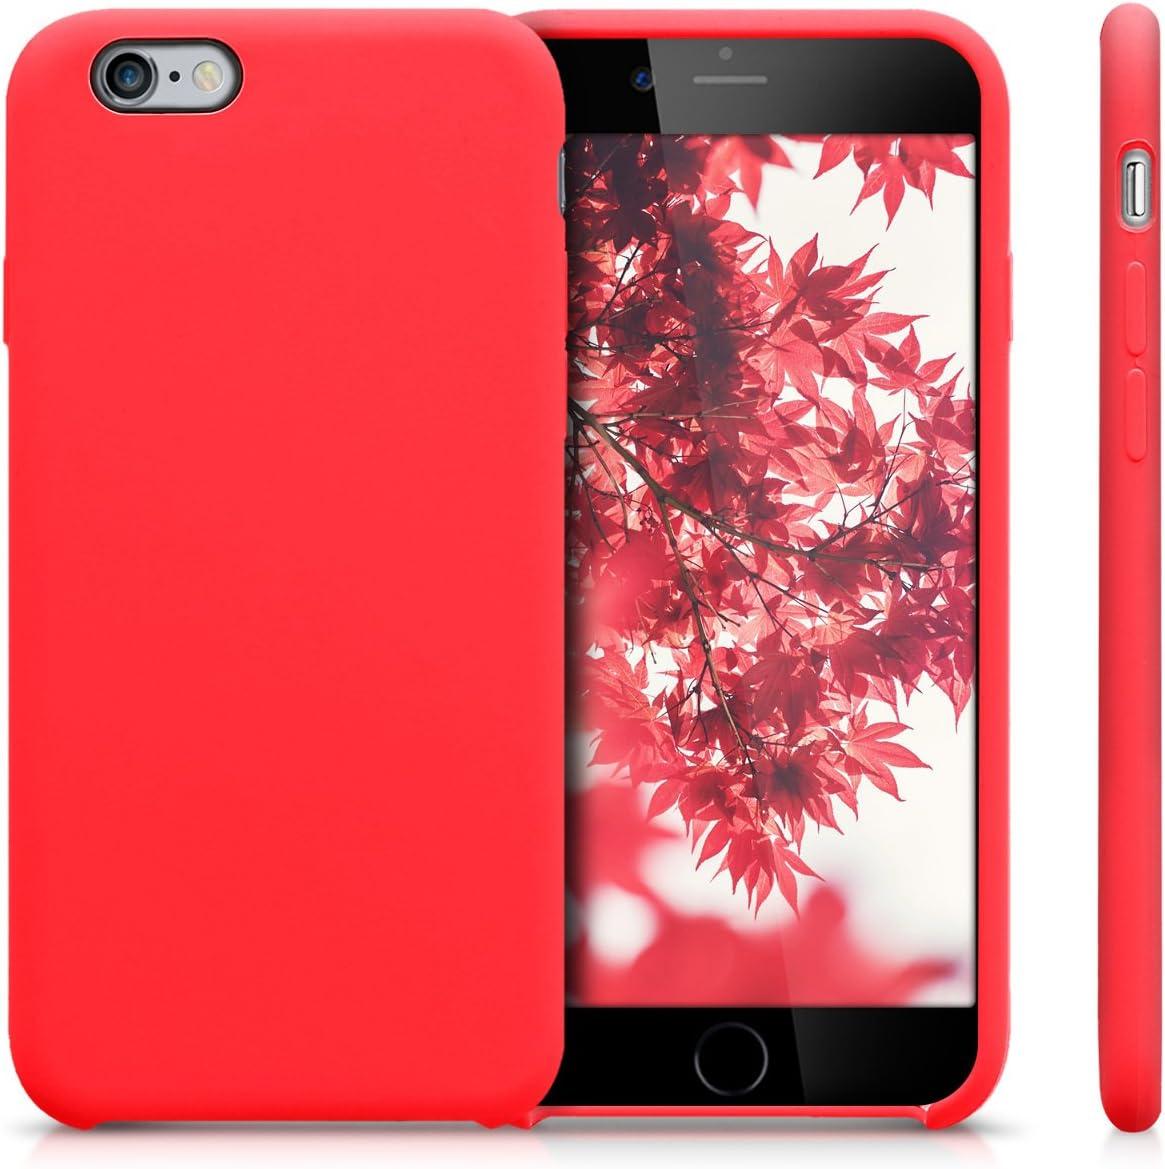 COVER IPHONE 5 5S SIMILE ORIGINALE APPLE COLORE ROSSO  I phone